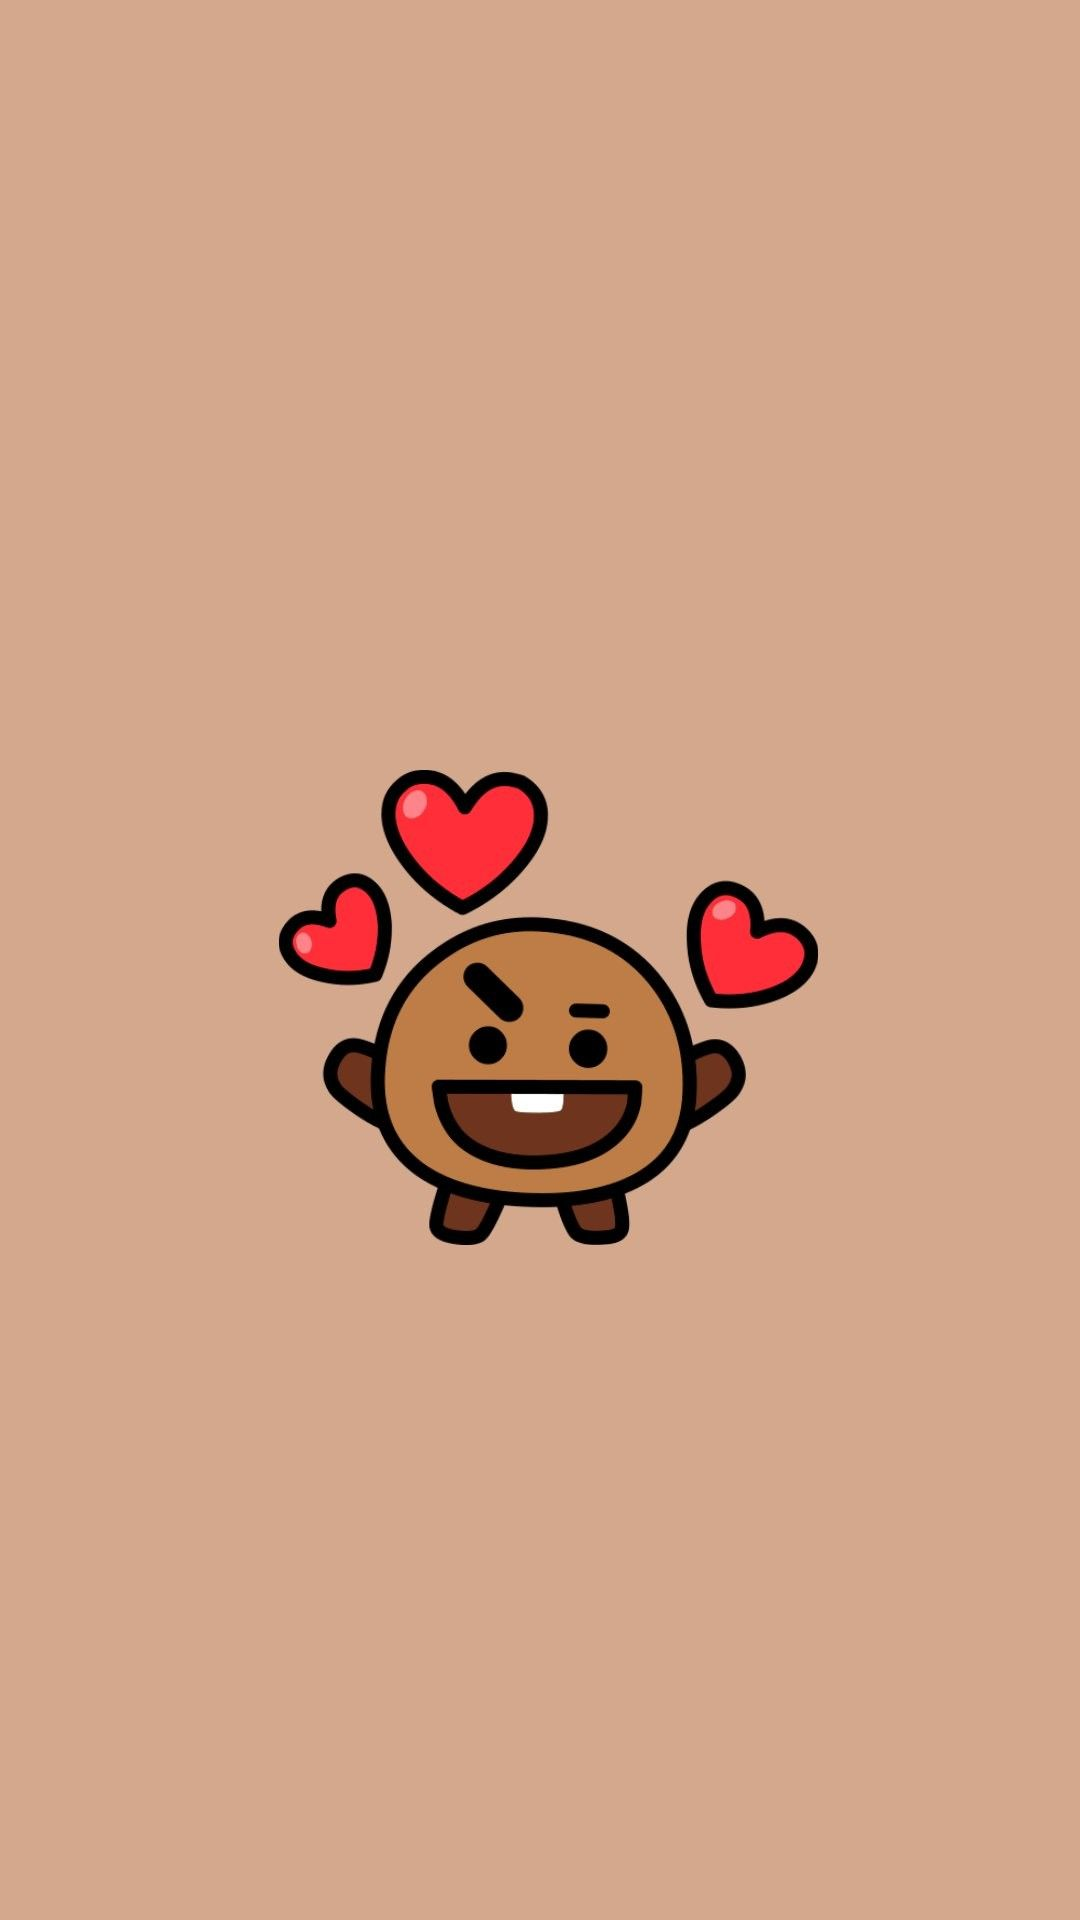 Bt21 Shooky Ilustrasi Karakter Boneka Hewan Gambar Hewan Lucu